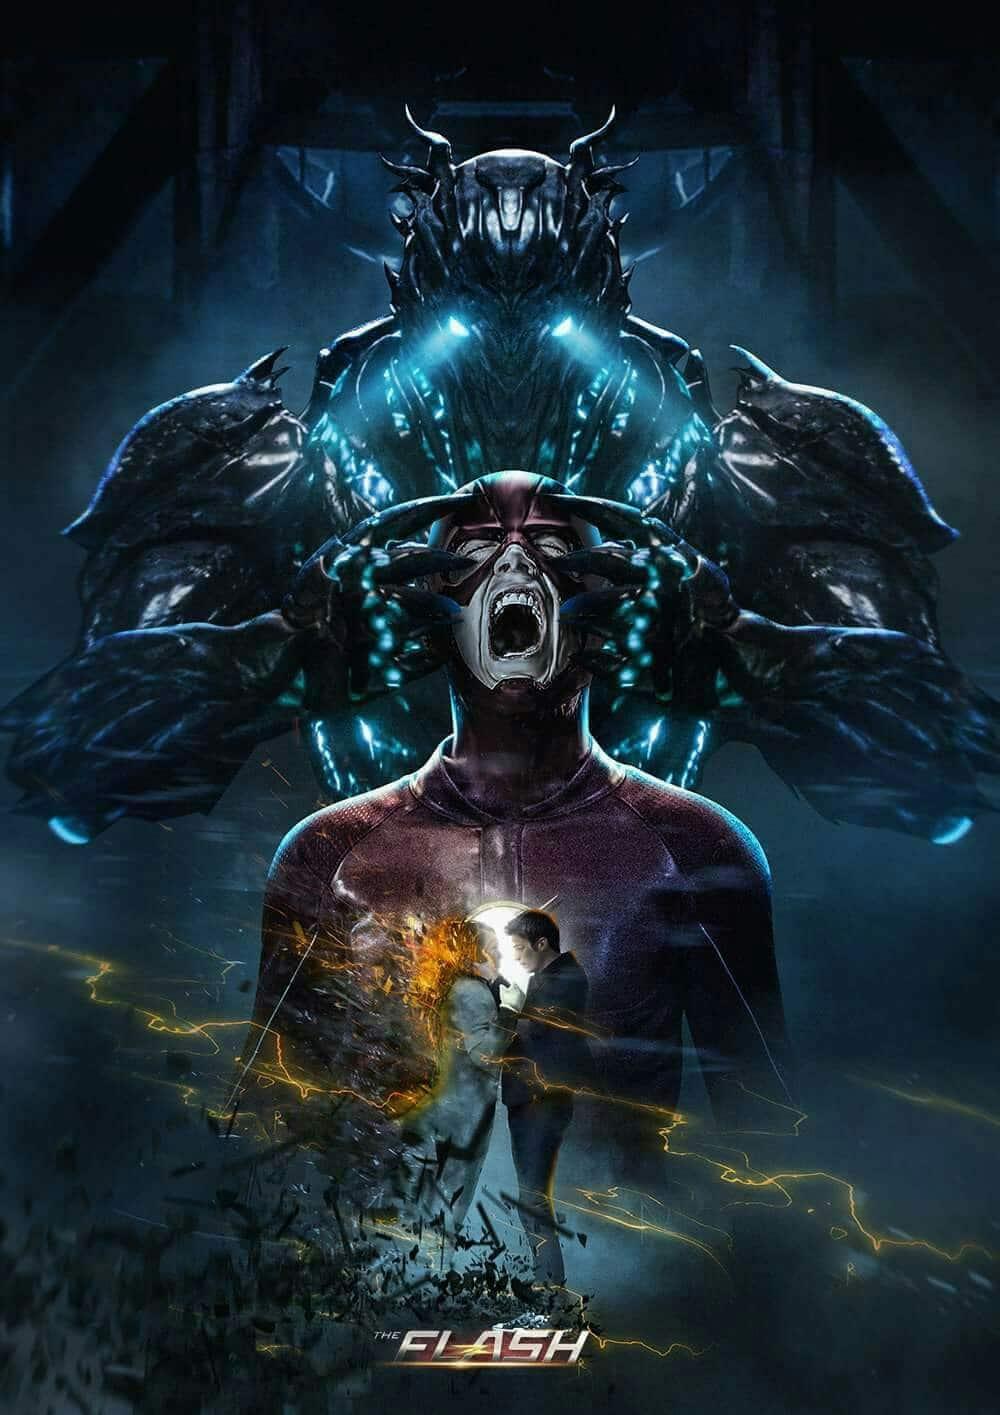 The Flash Savitar poster